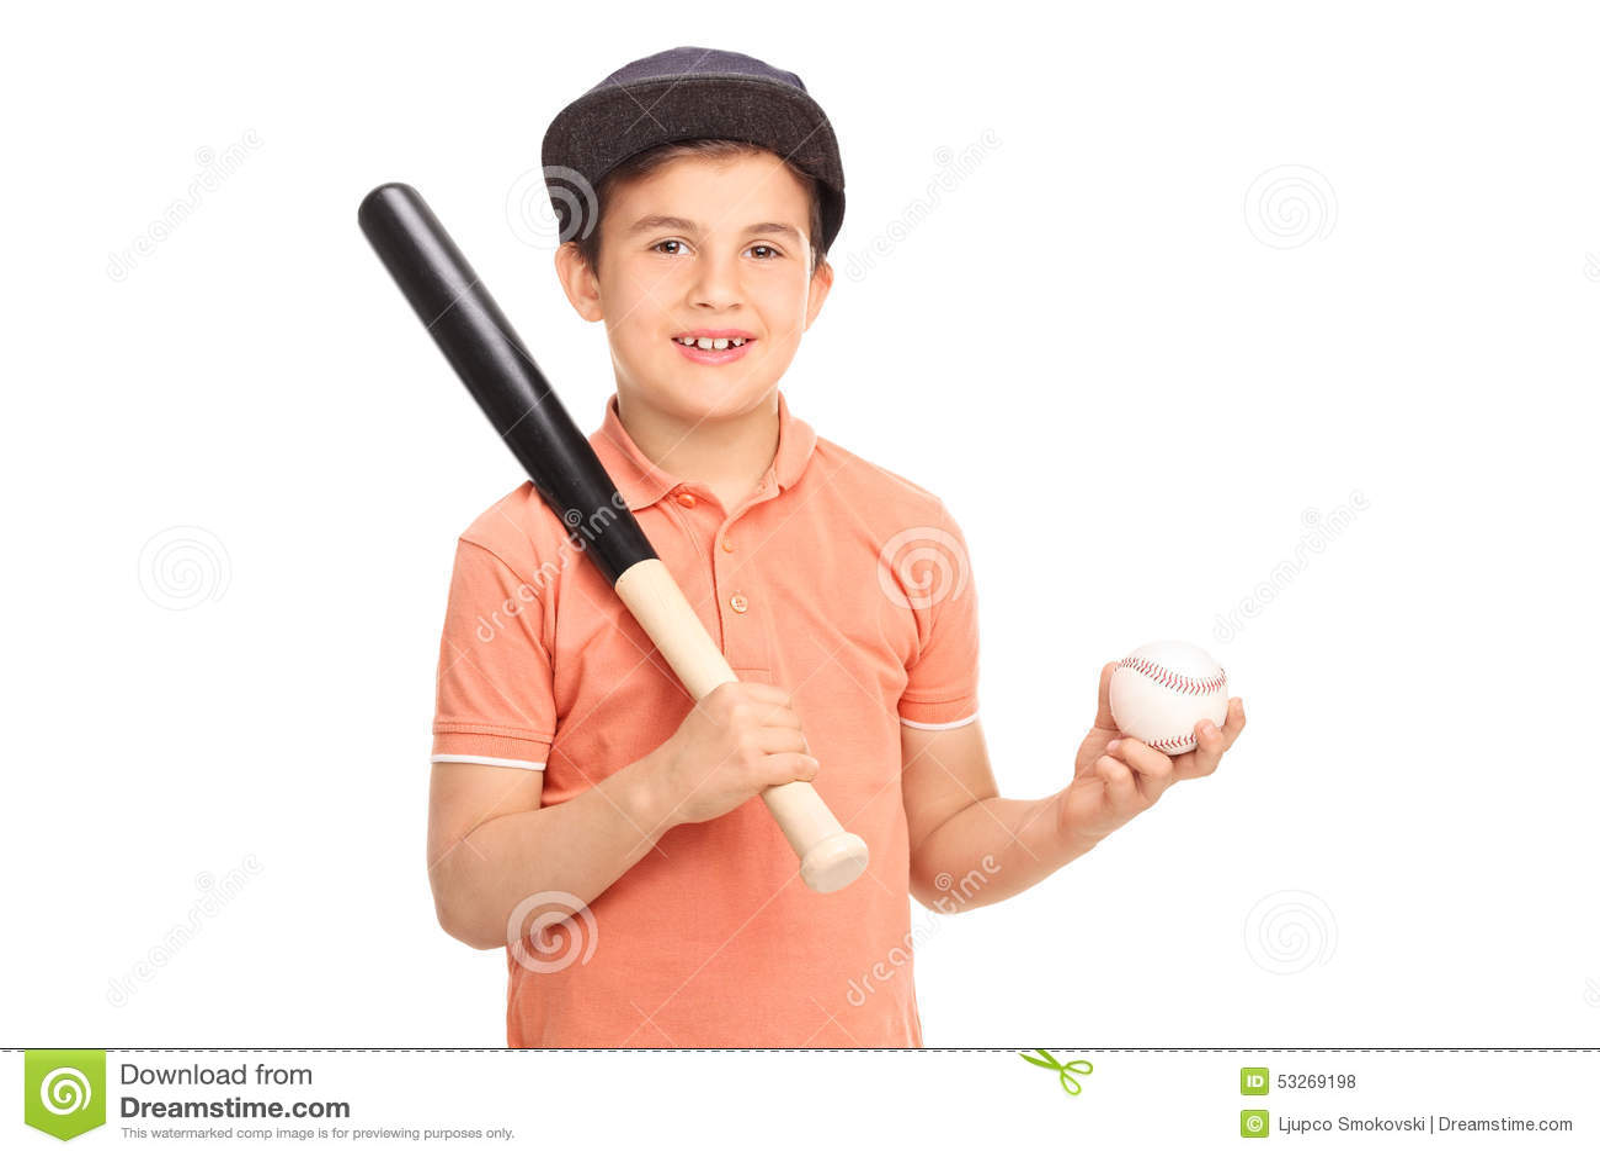 cheerful kid holding a baseball bat stock photo image 65612461